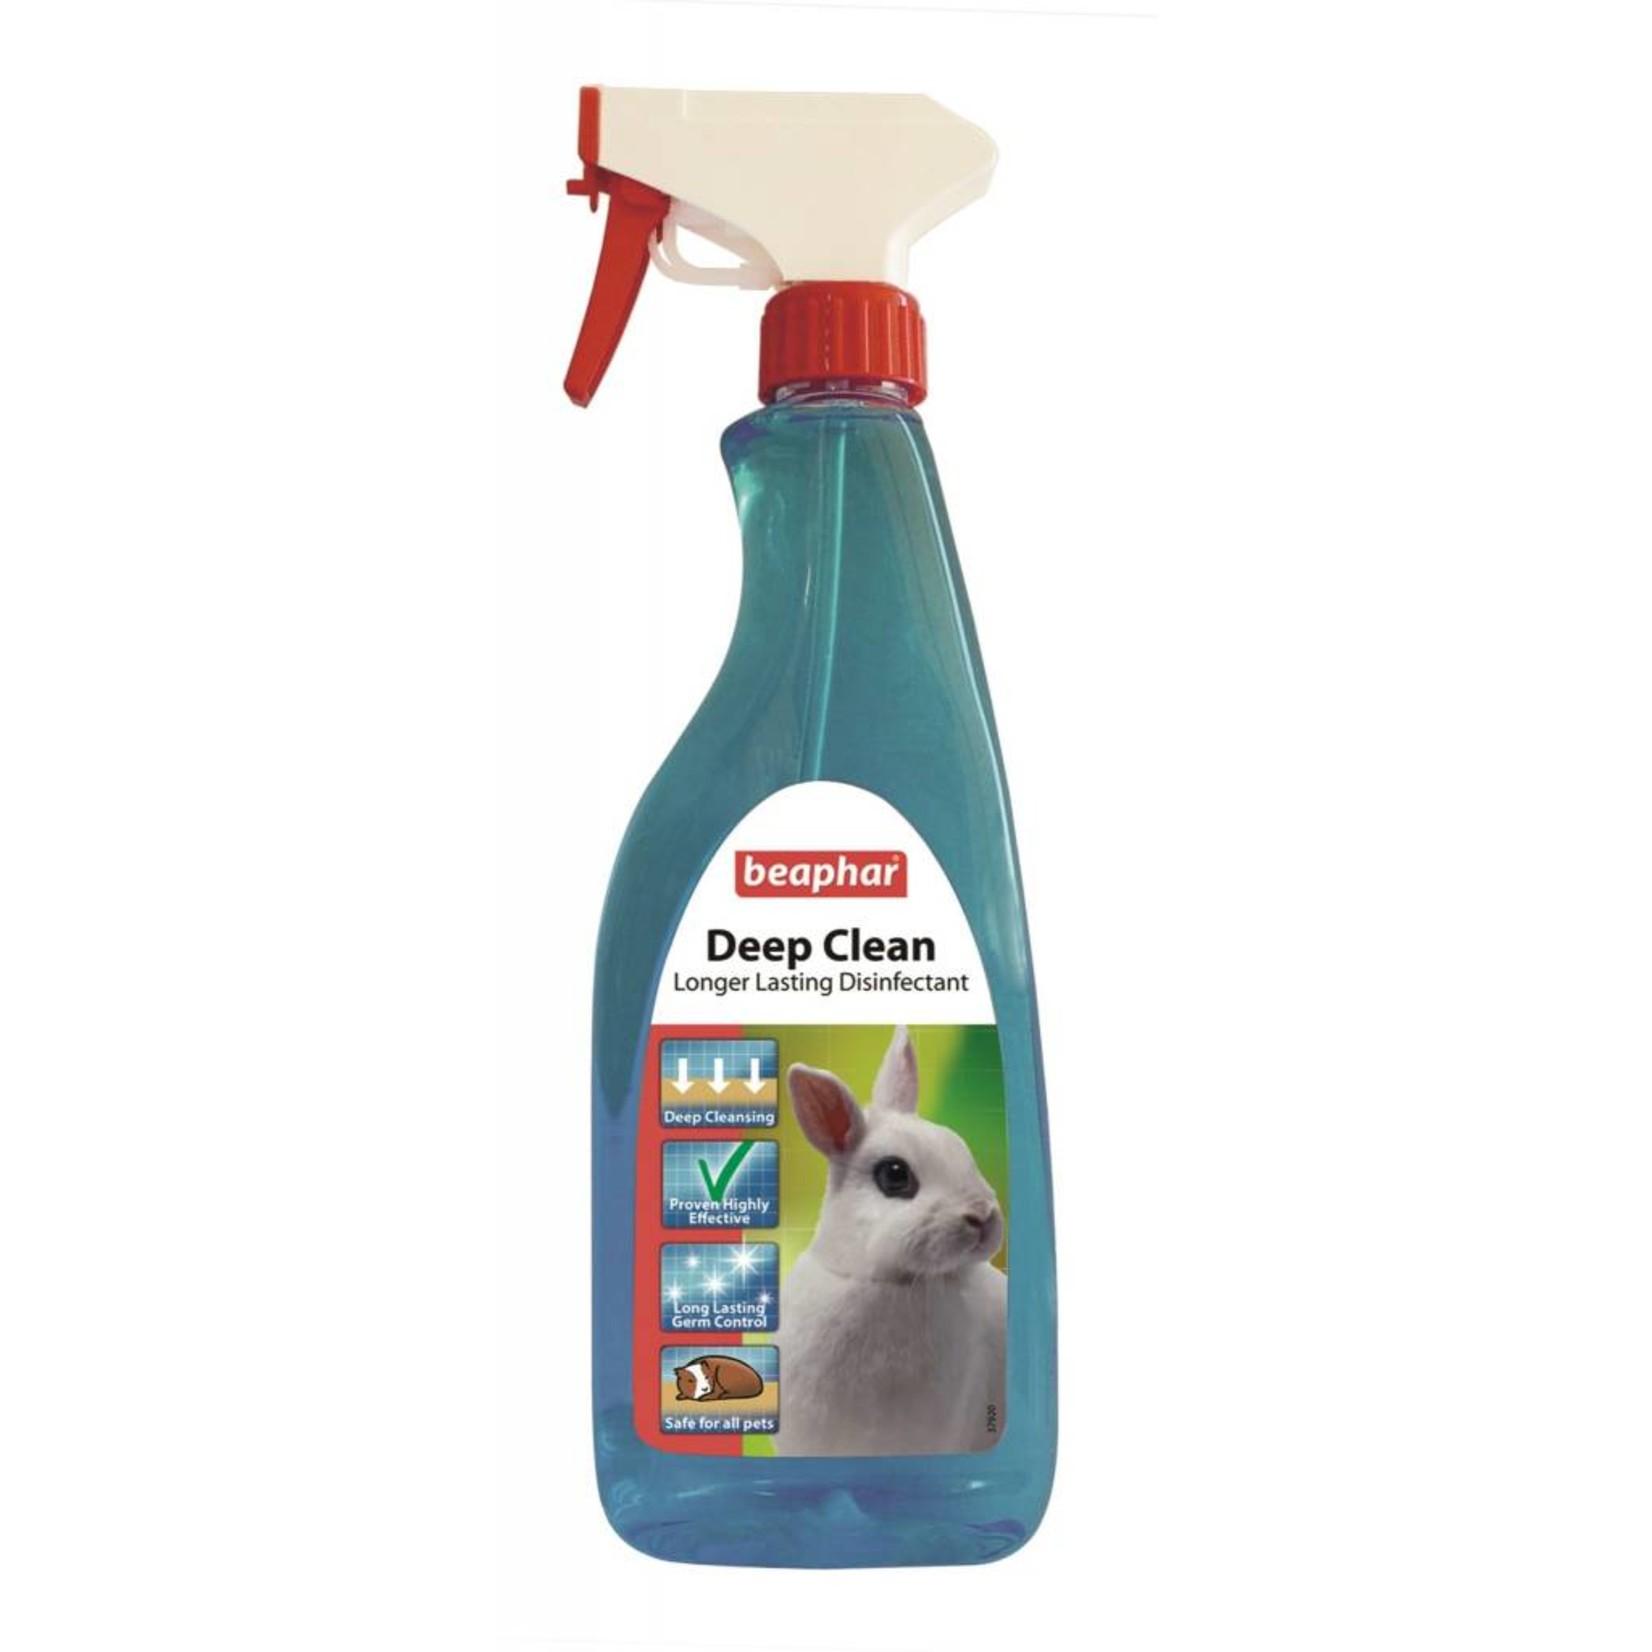 Beaphar Deep Clean Disinfectant, 500ml